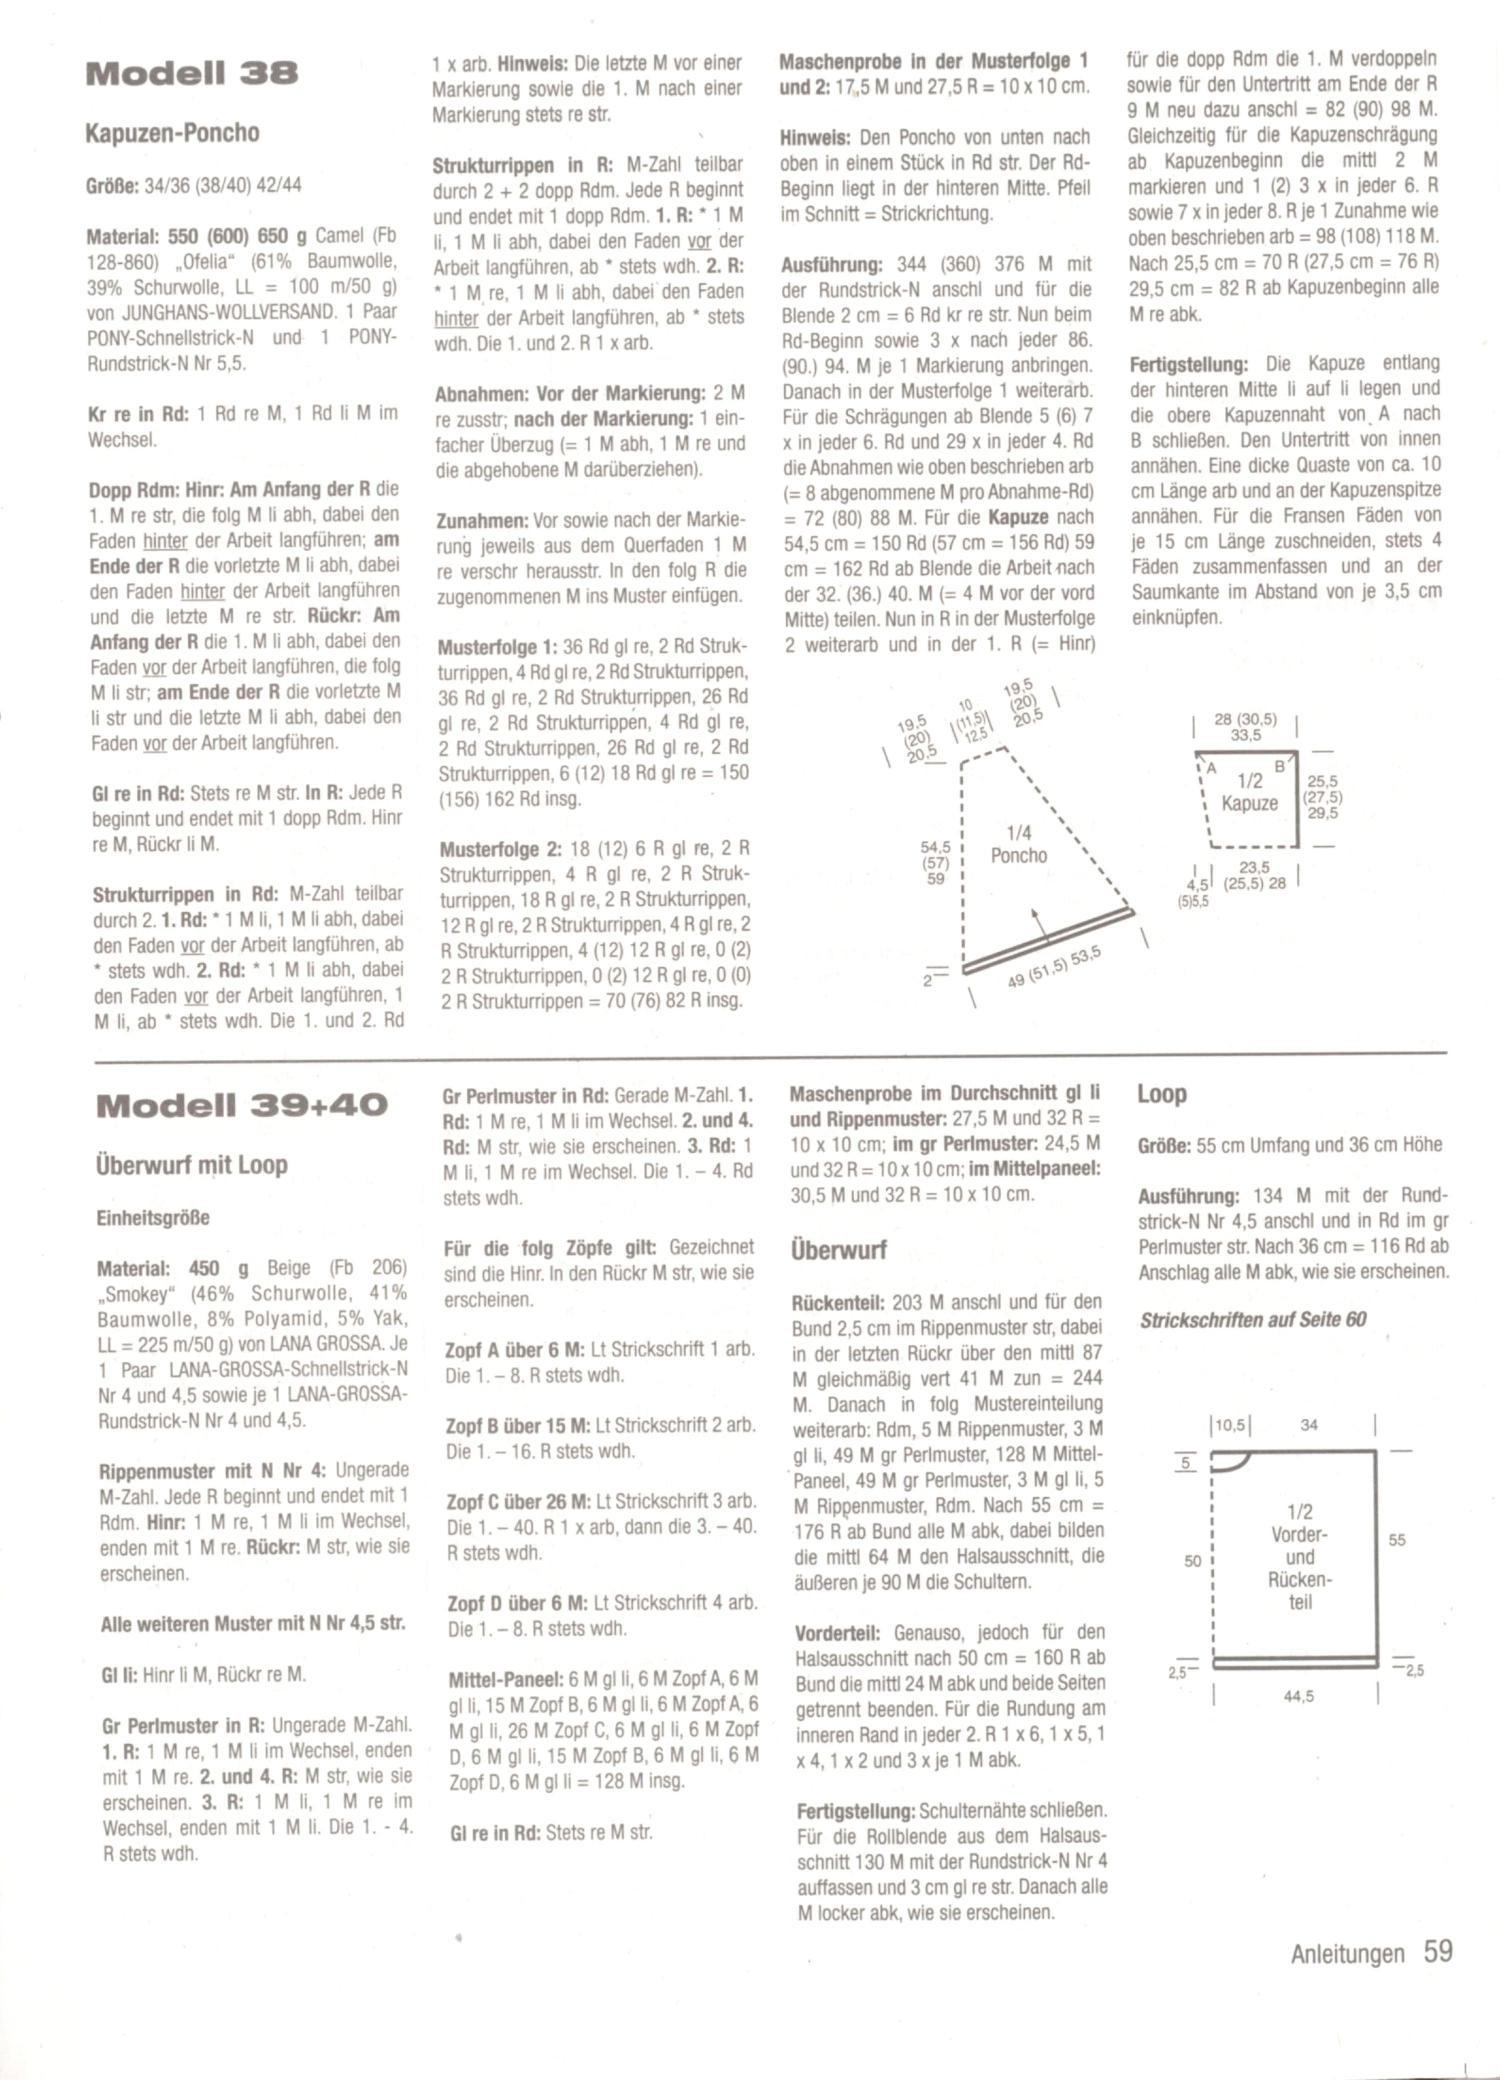 Page_00059.jpg